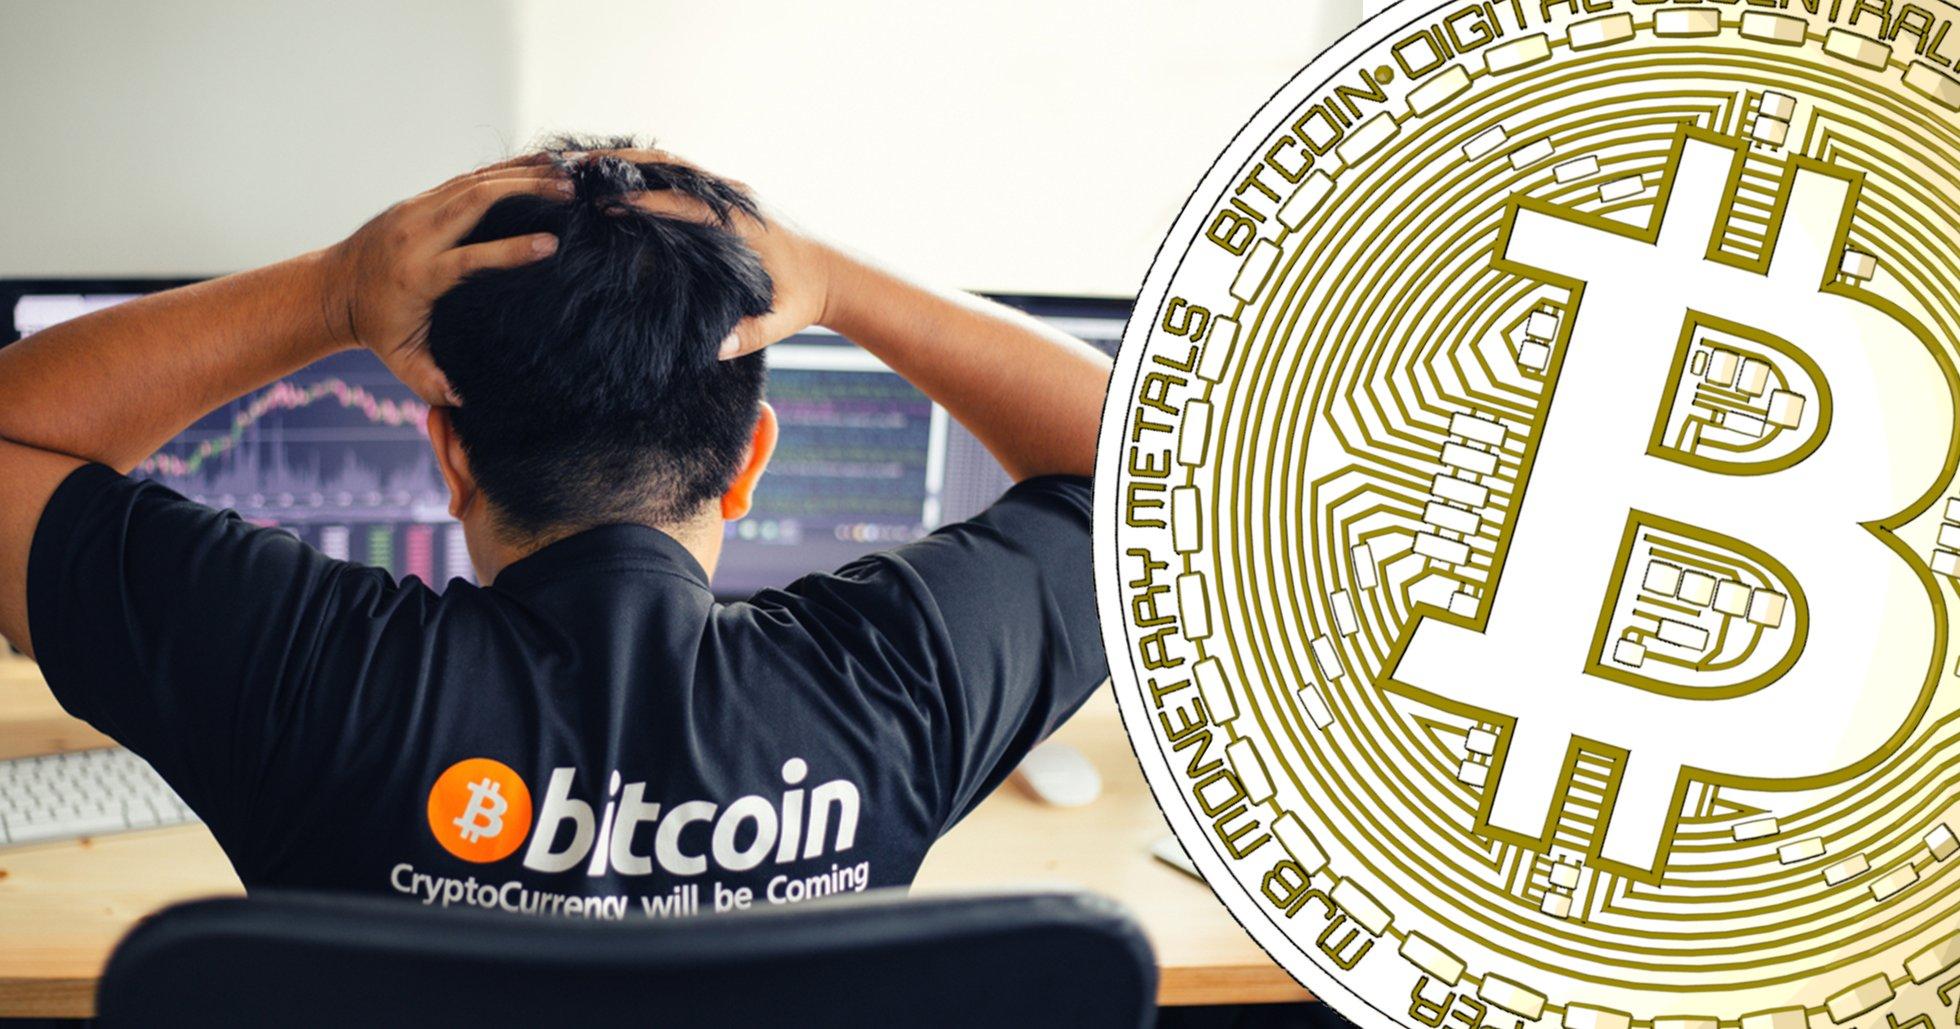 Jättebörsen kraschade – då störtdök bitcoin